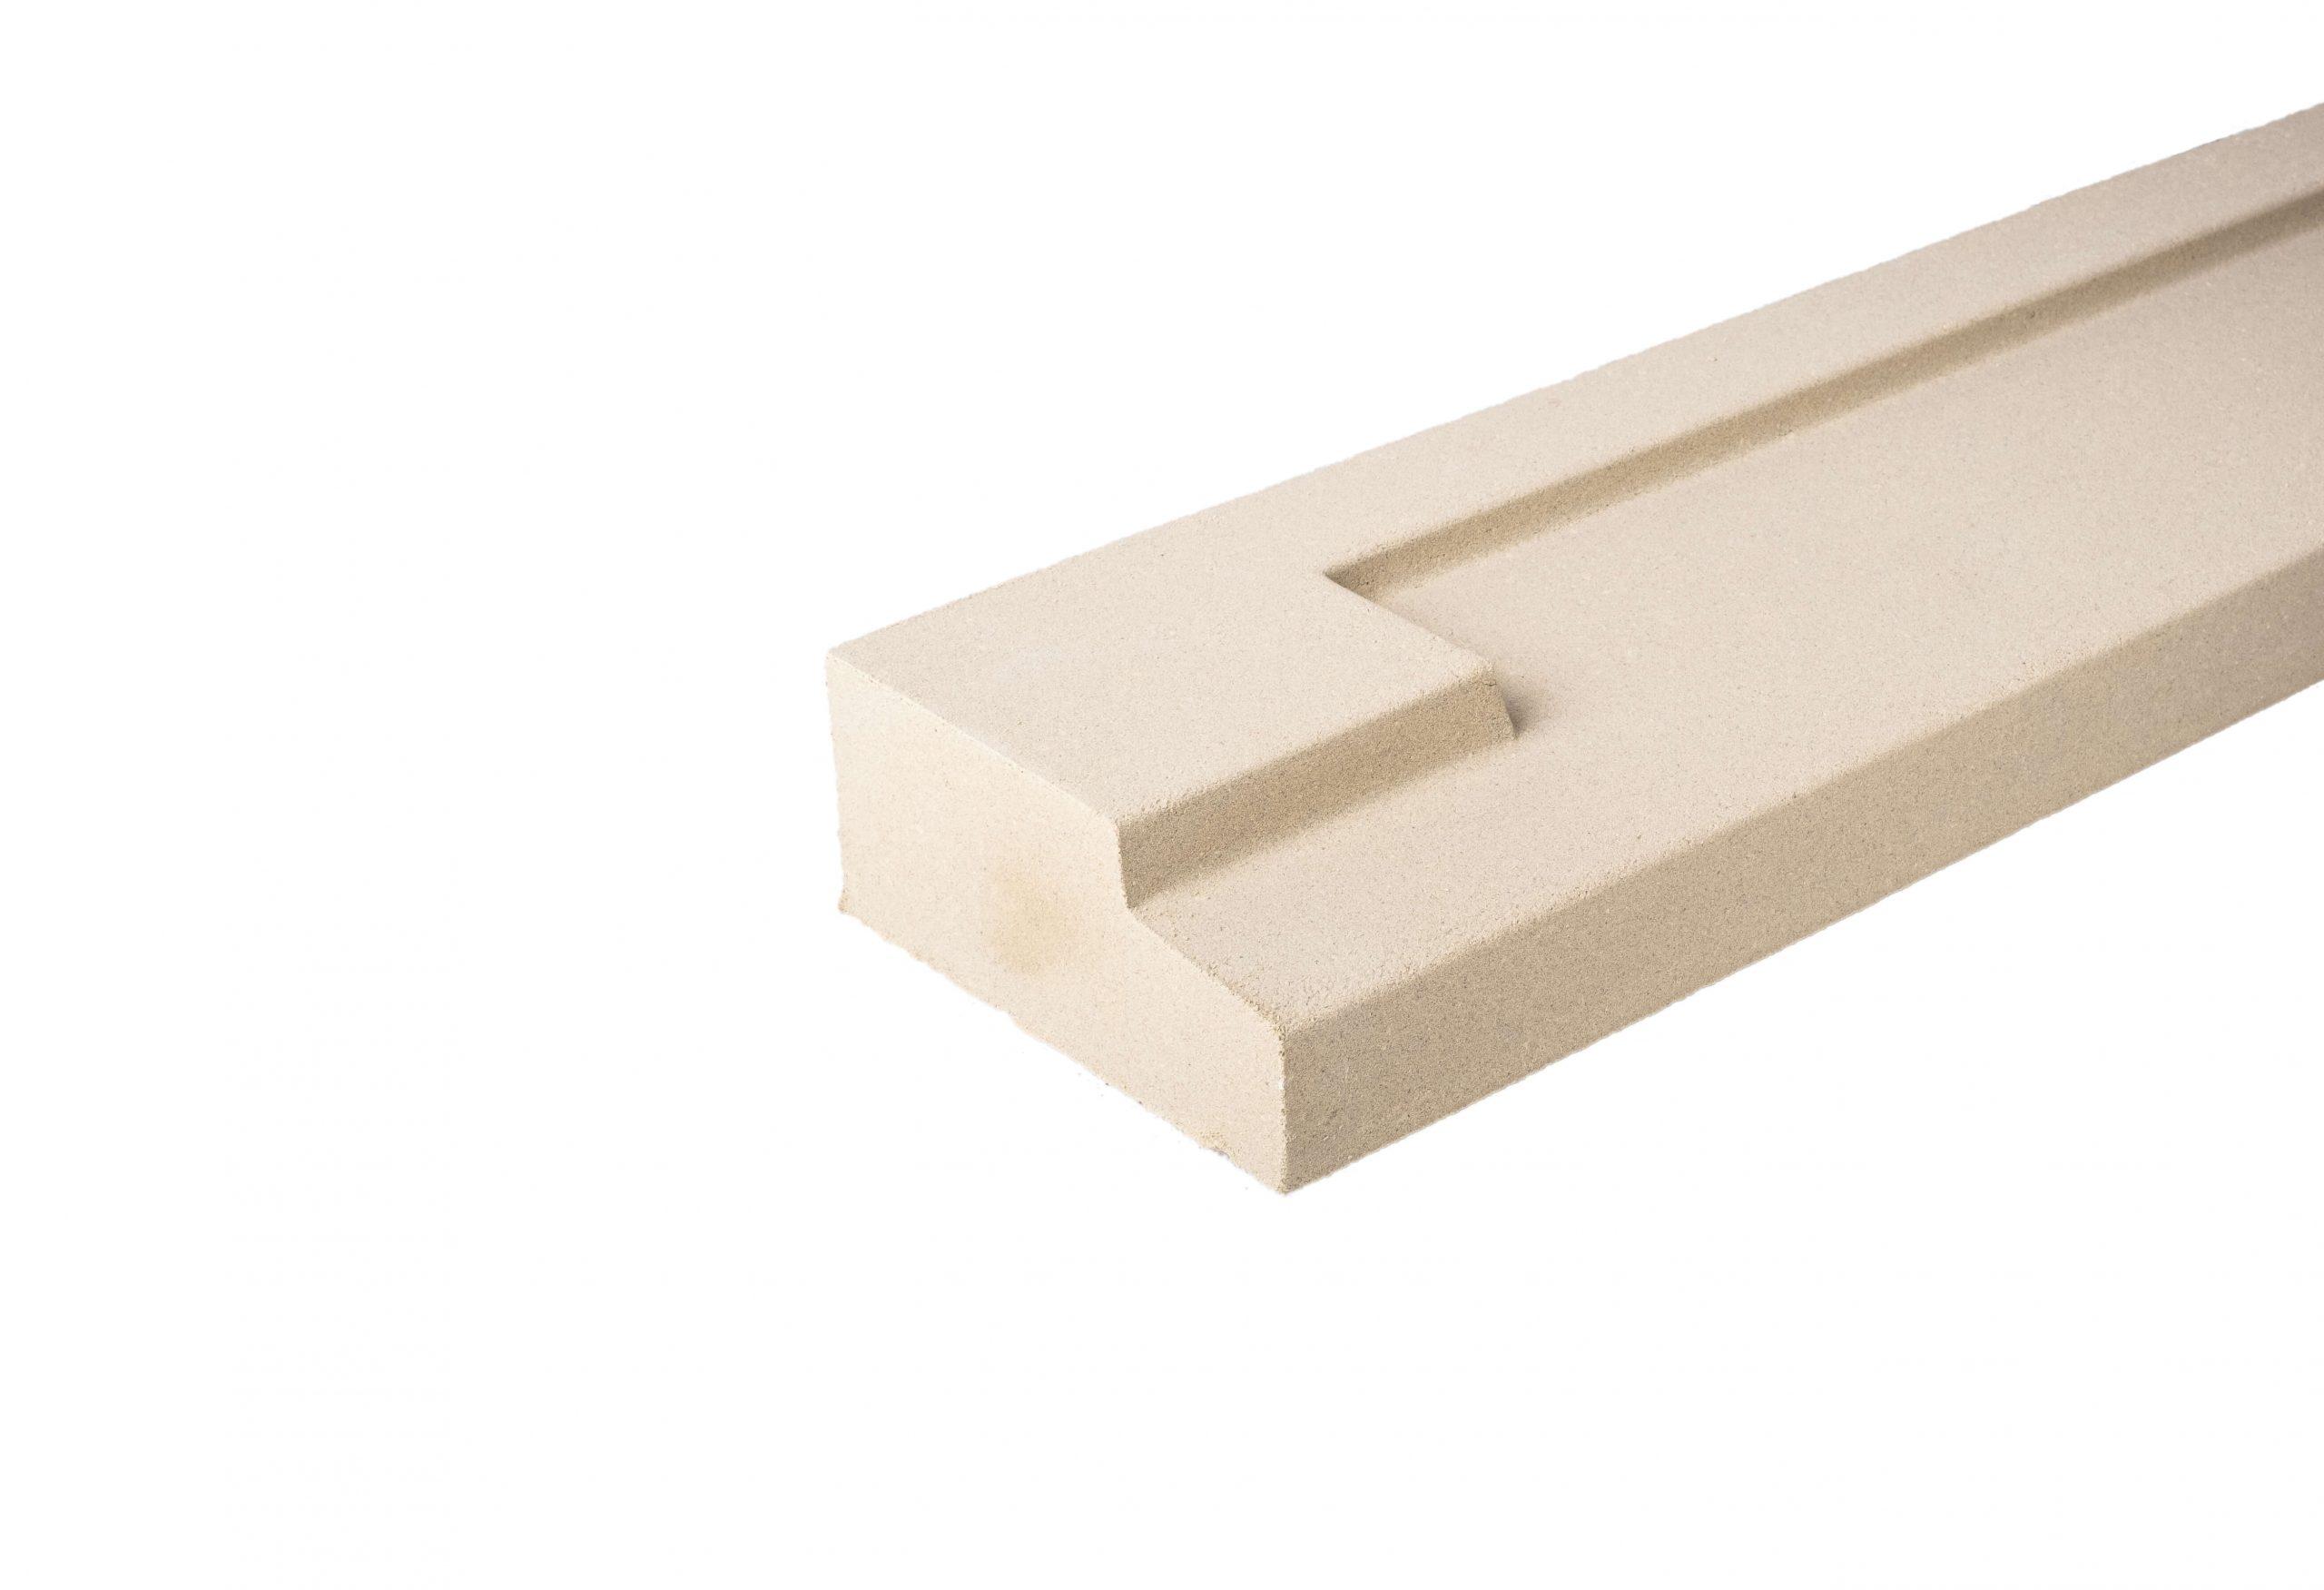 Cills (brickwork) 65mm high